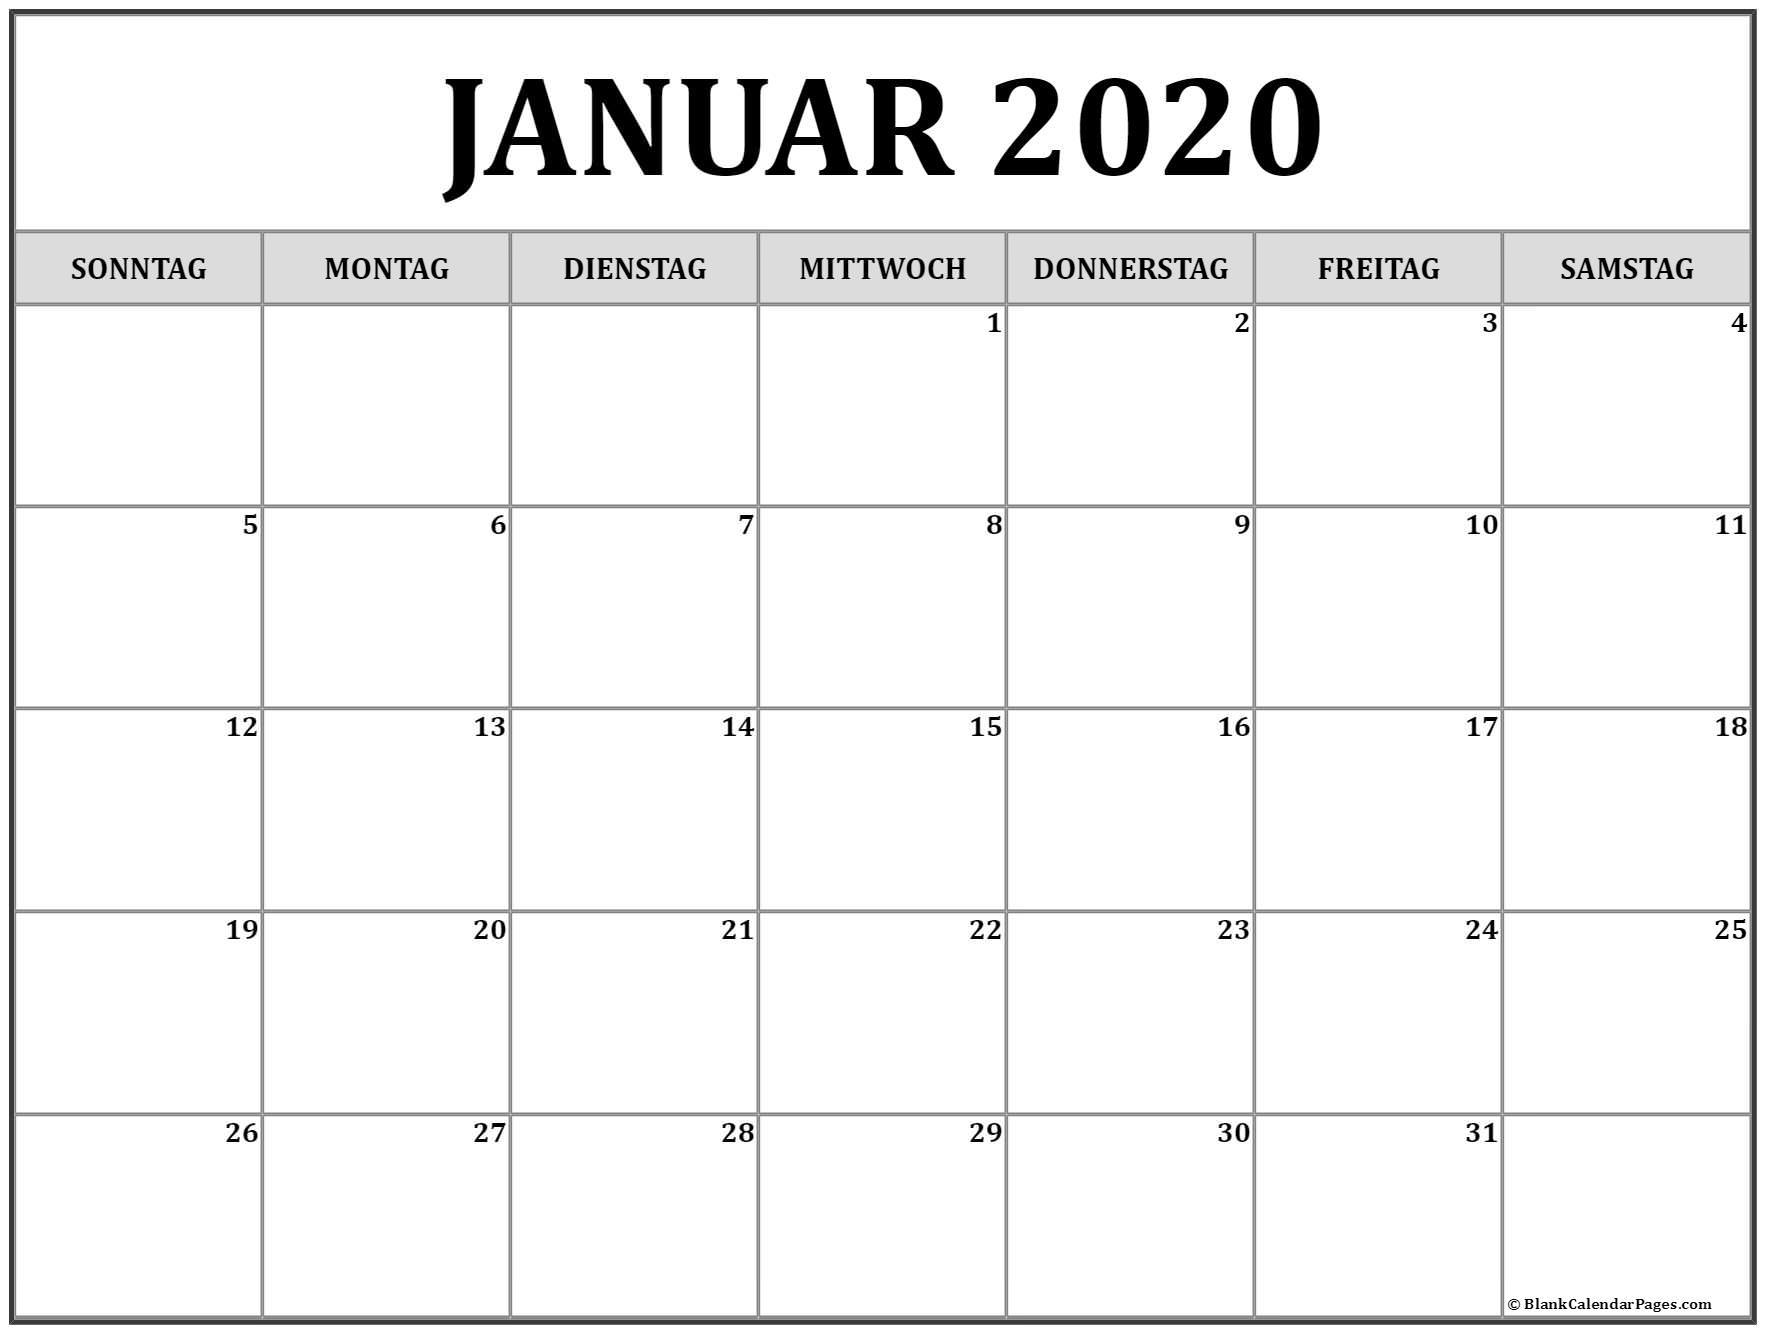 Januar 2020 Kalender | Kalender 2020 | Avnitasoni